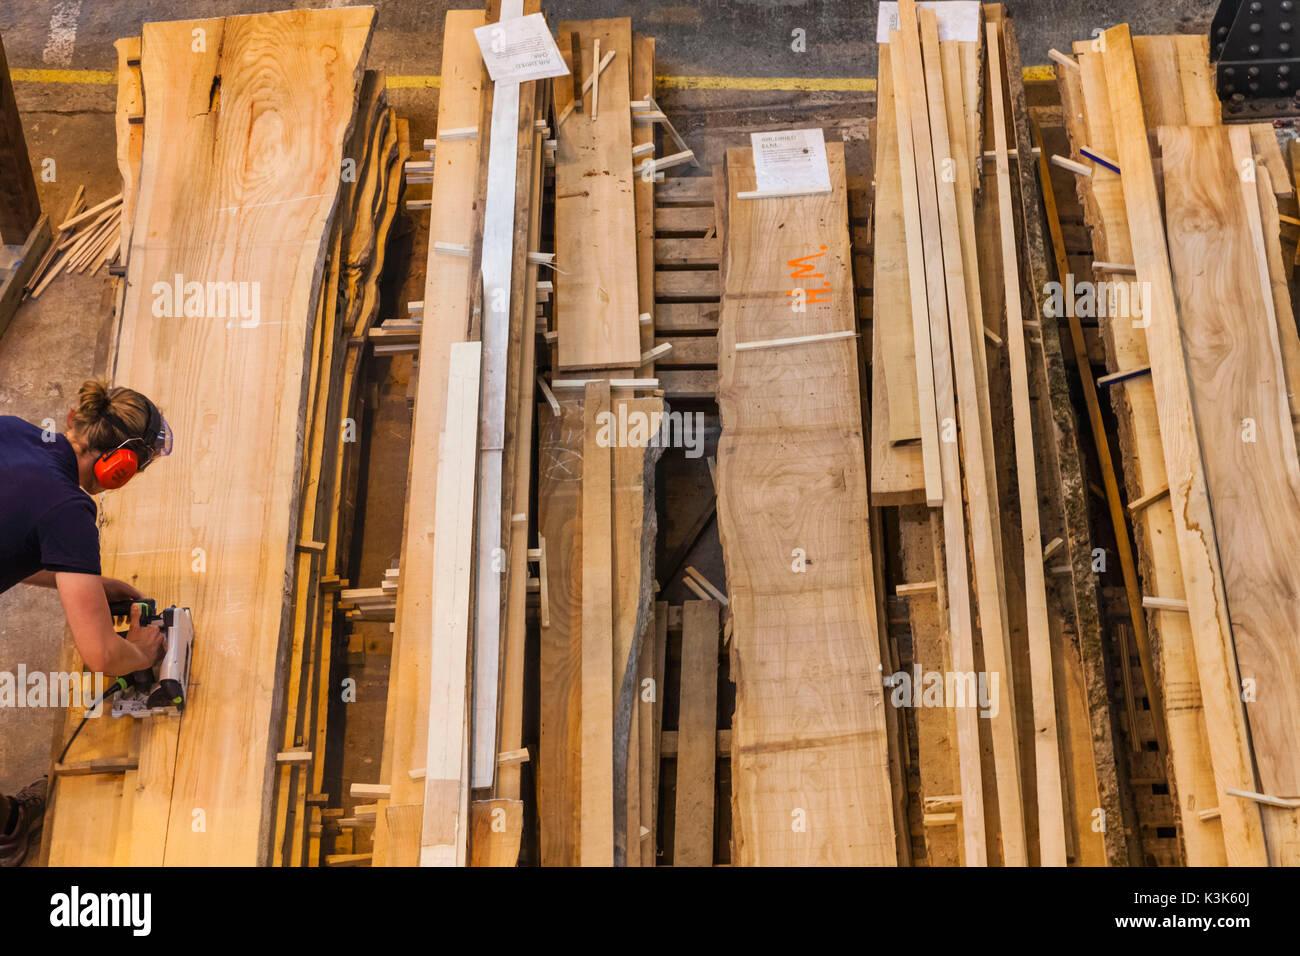 England, Hampshire, Portsmouth, Portsmouth Historic Dockyard, Boathouse 4, Boat Building and Restoration, Cutting Wooden Planks - Stock Image